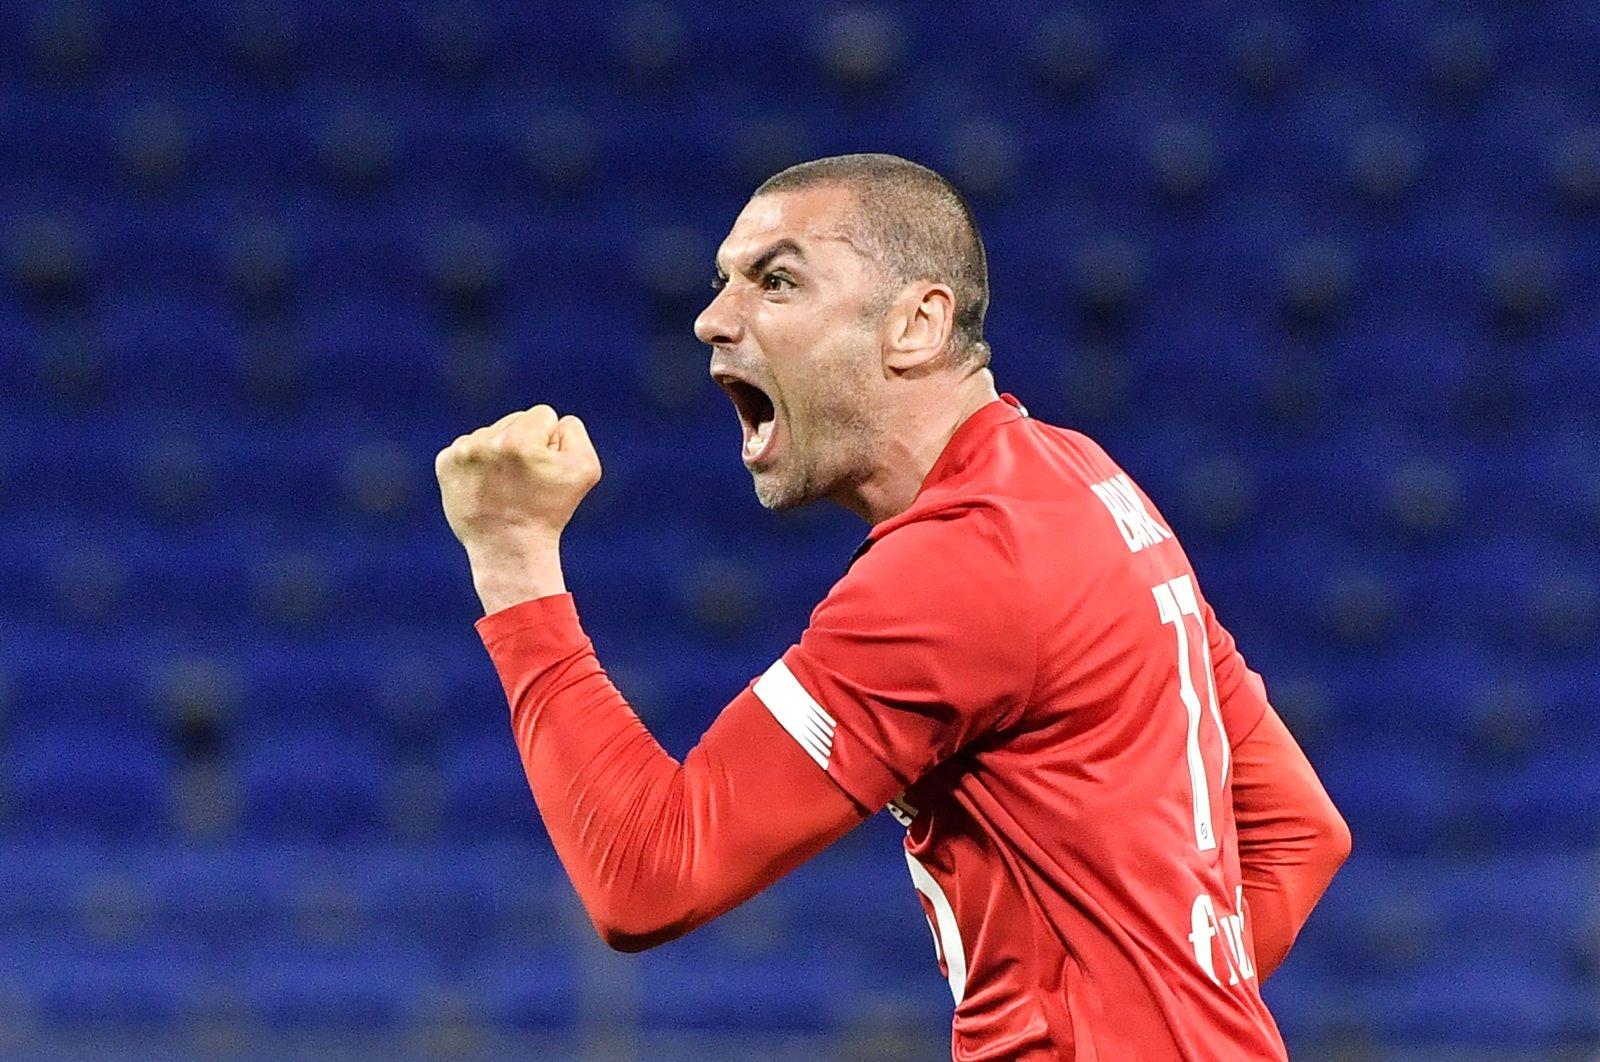 Lille's Turkish forward Burak Yılmaz reacts after scoring during the Ligue 1 football match against Lyon at the Groupama Stadium in Decines-Charpieu near Lyon, France, April 25, 2021. (AFP Photo)